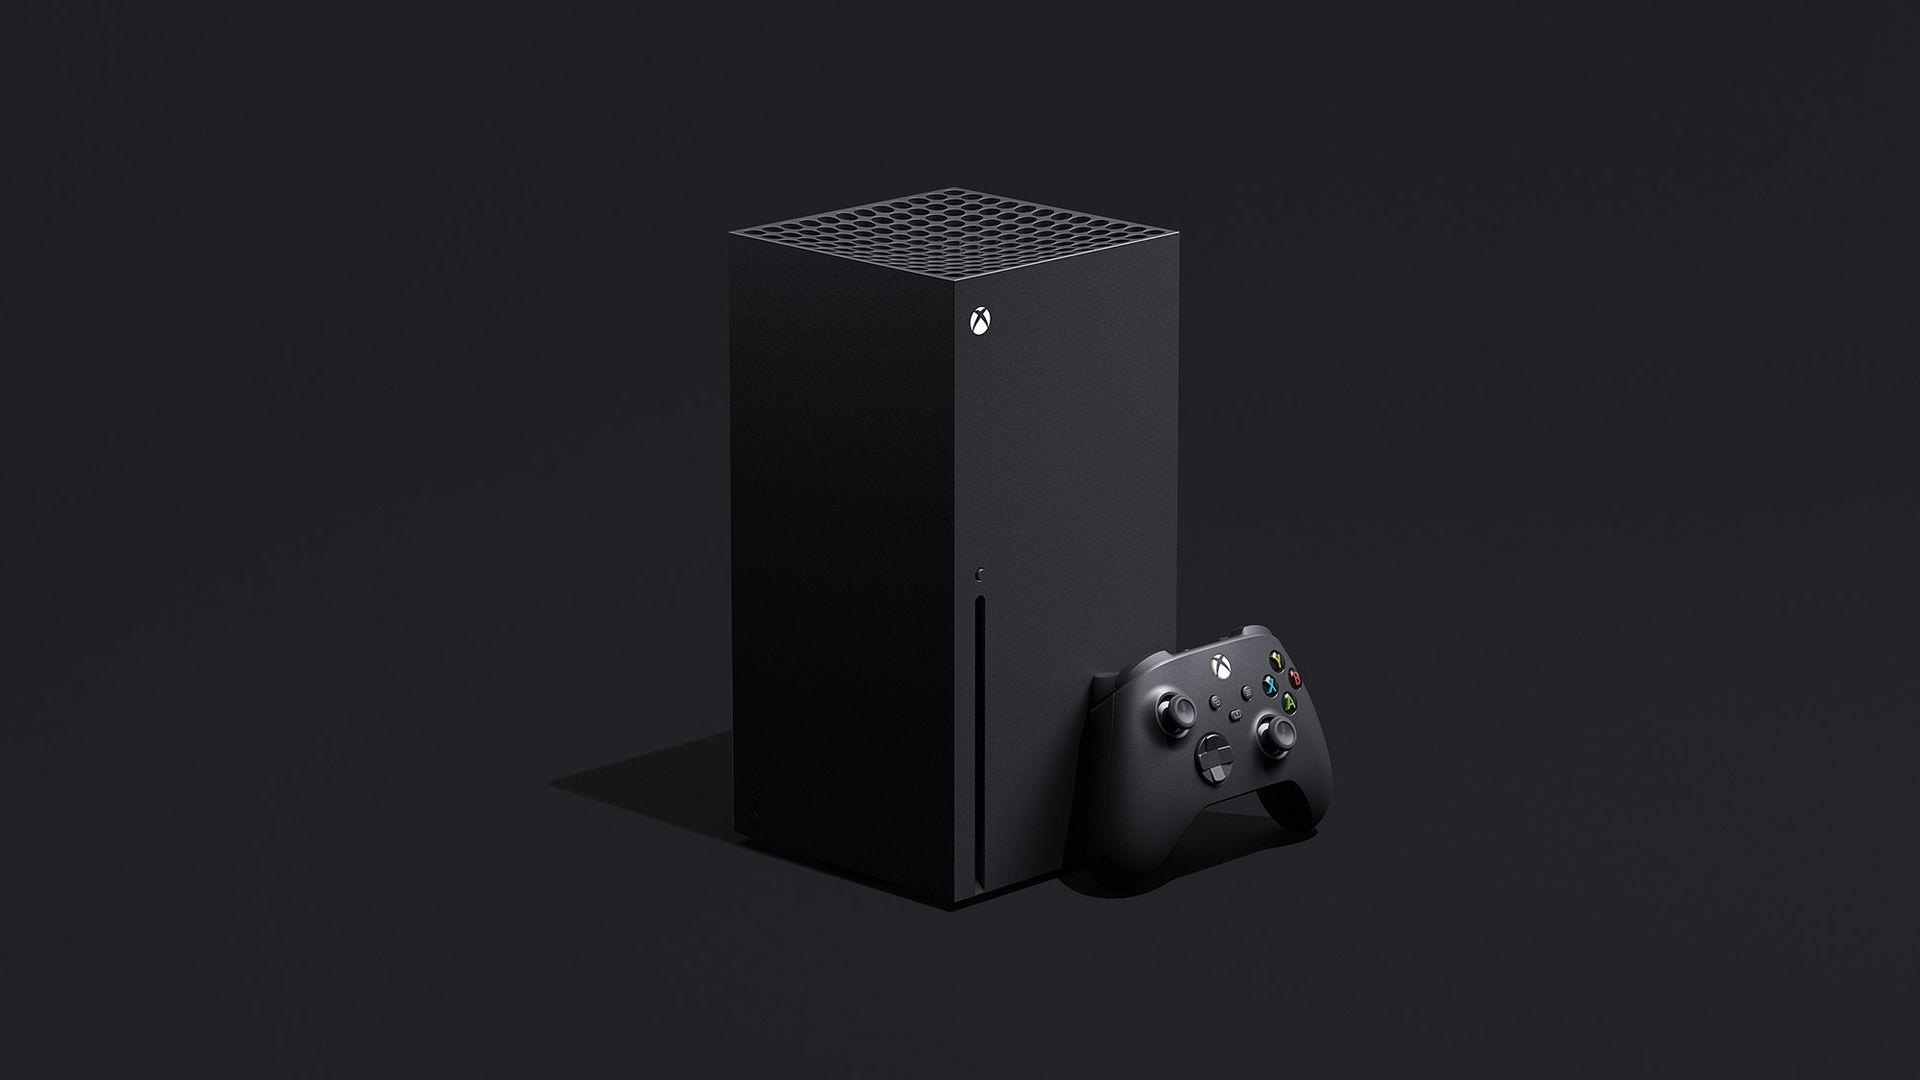 Microsoft kommer tillverka riktiga Xbox-minikylar Perfekt att ha bredvid Xbox Series X